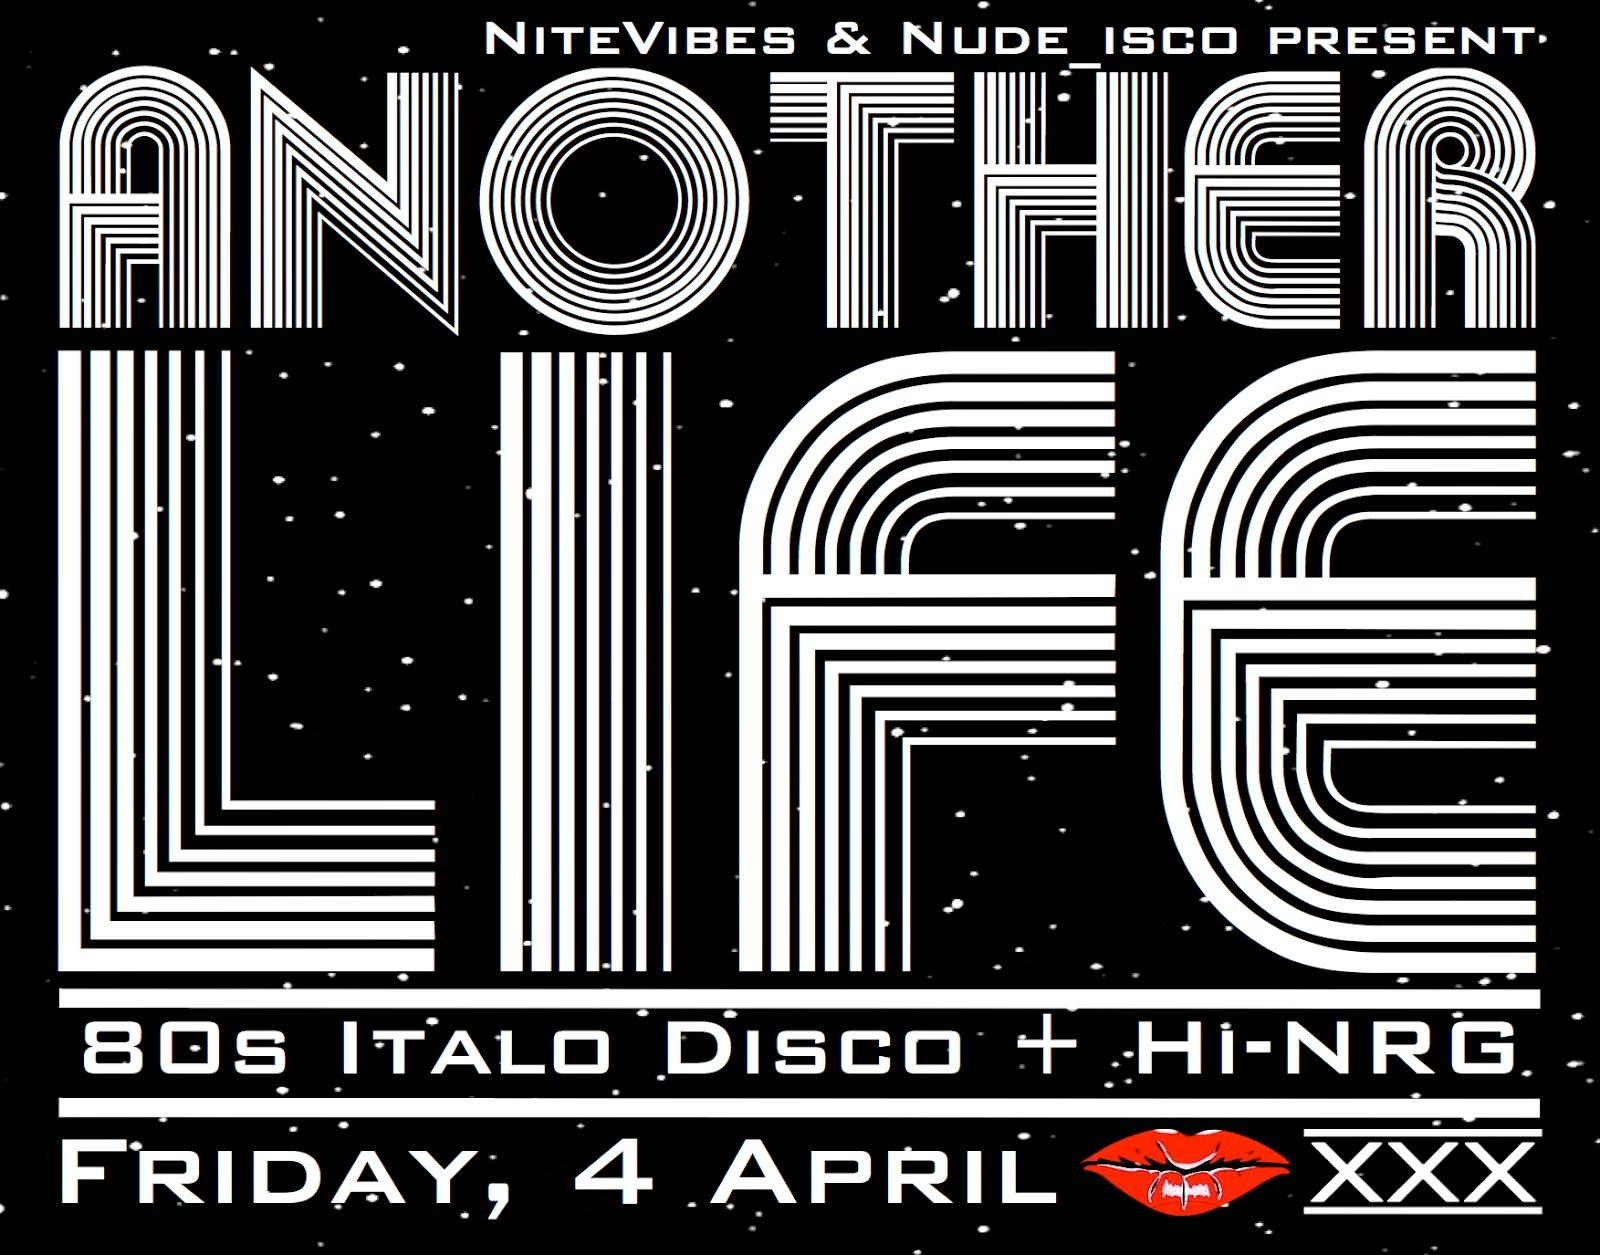 ANOTHER LIFE - Italo & Hi-NRG @ XXX Hong Kong | Nude_isco